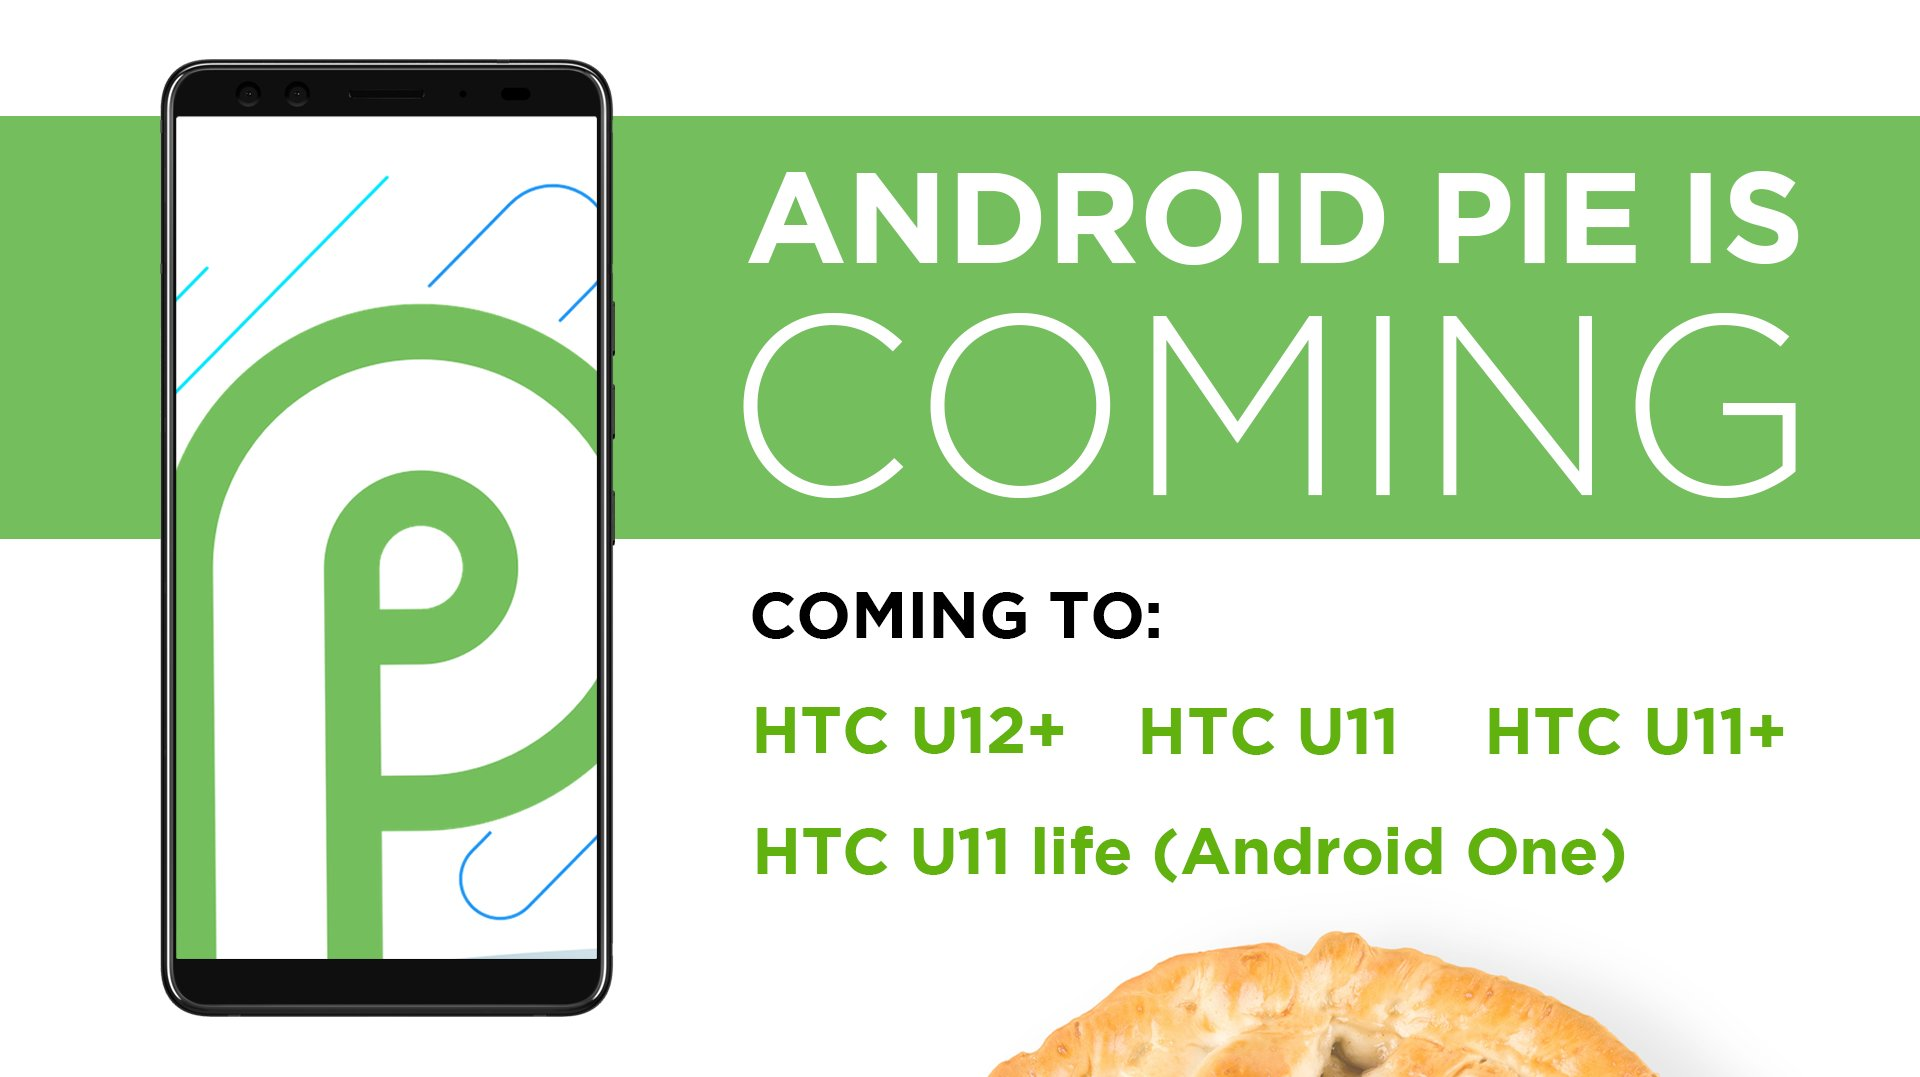 HTC on Twitter